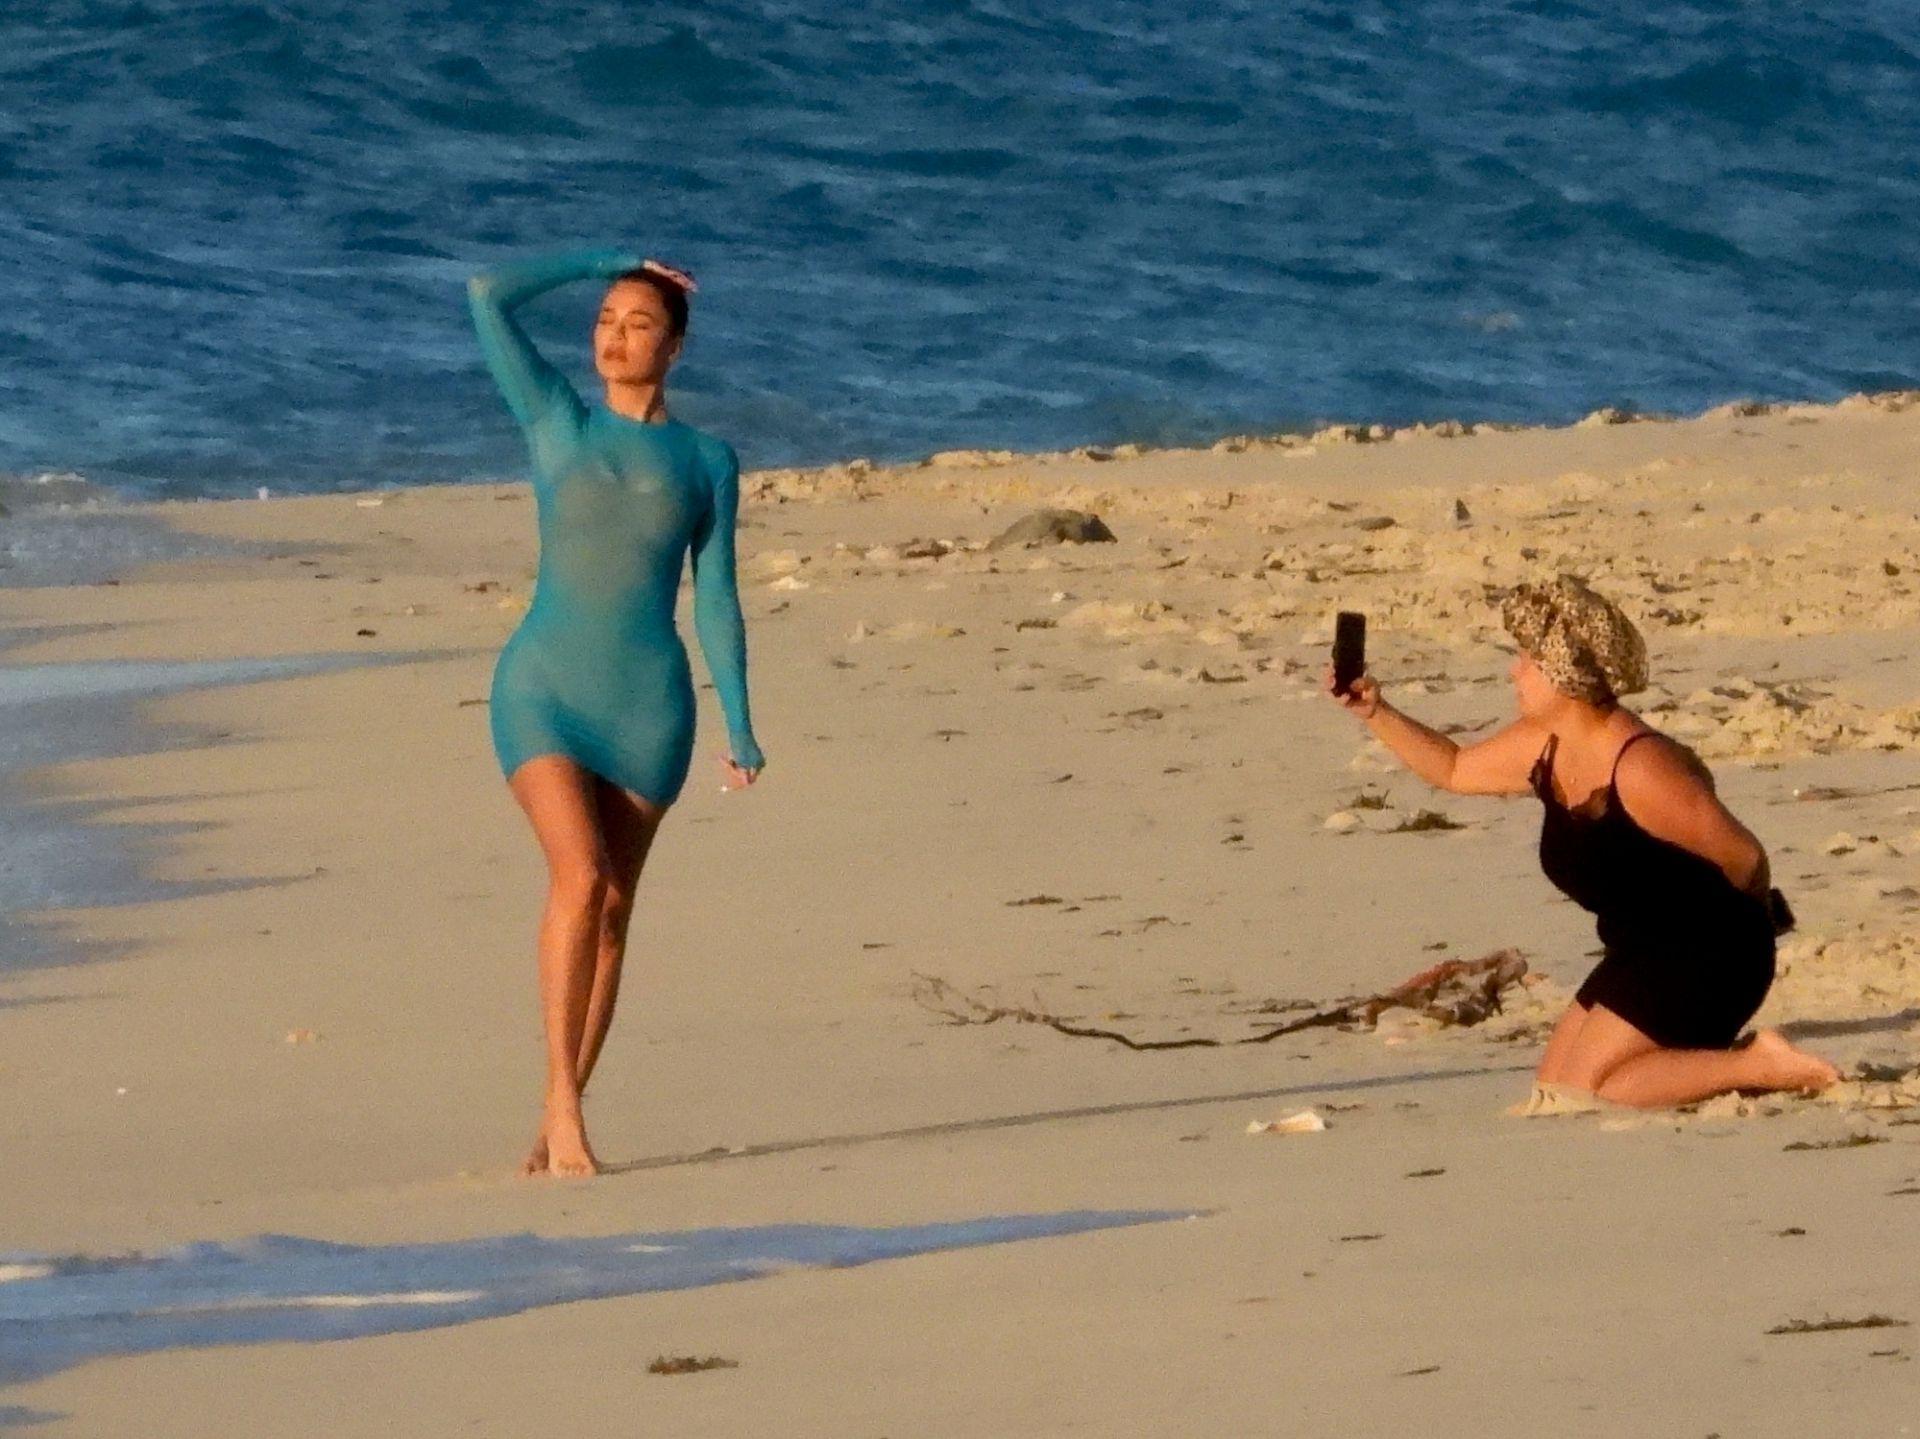 Khloe Kardashian Big Ass On Beach